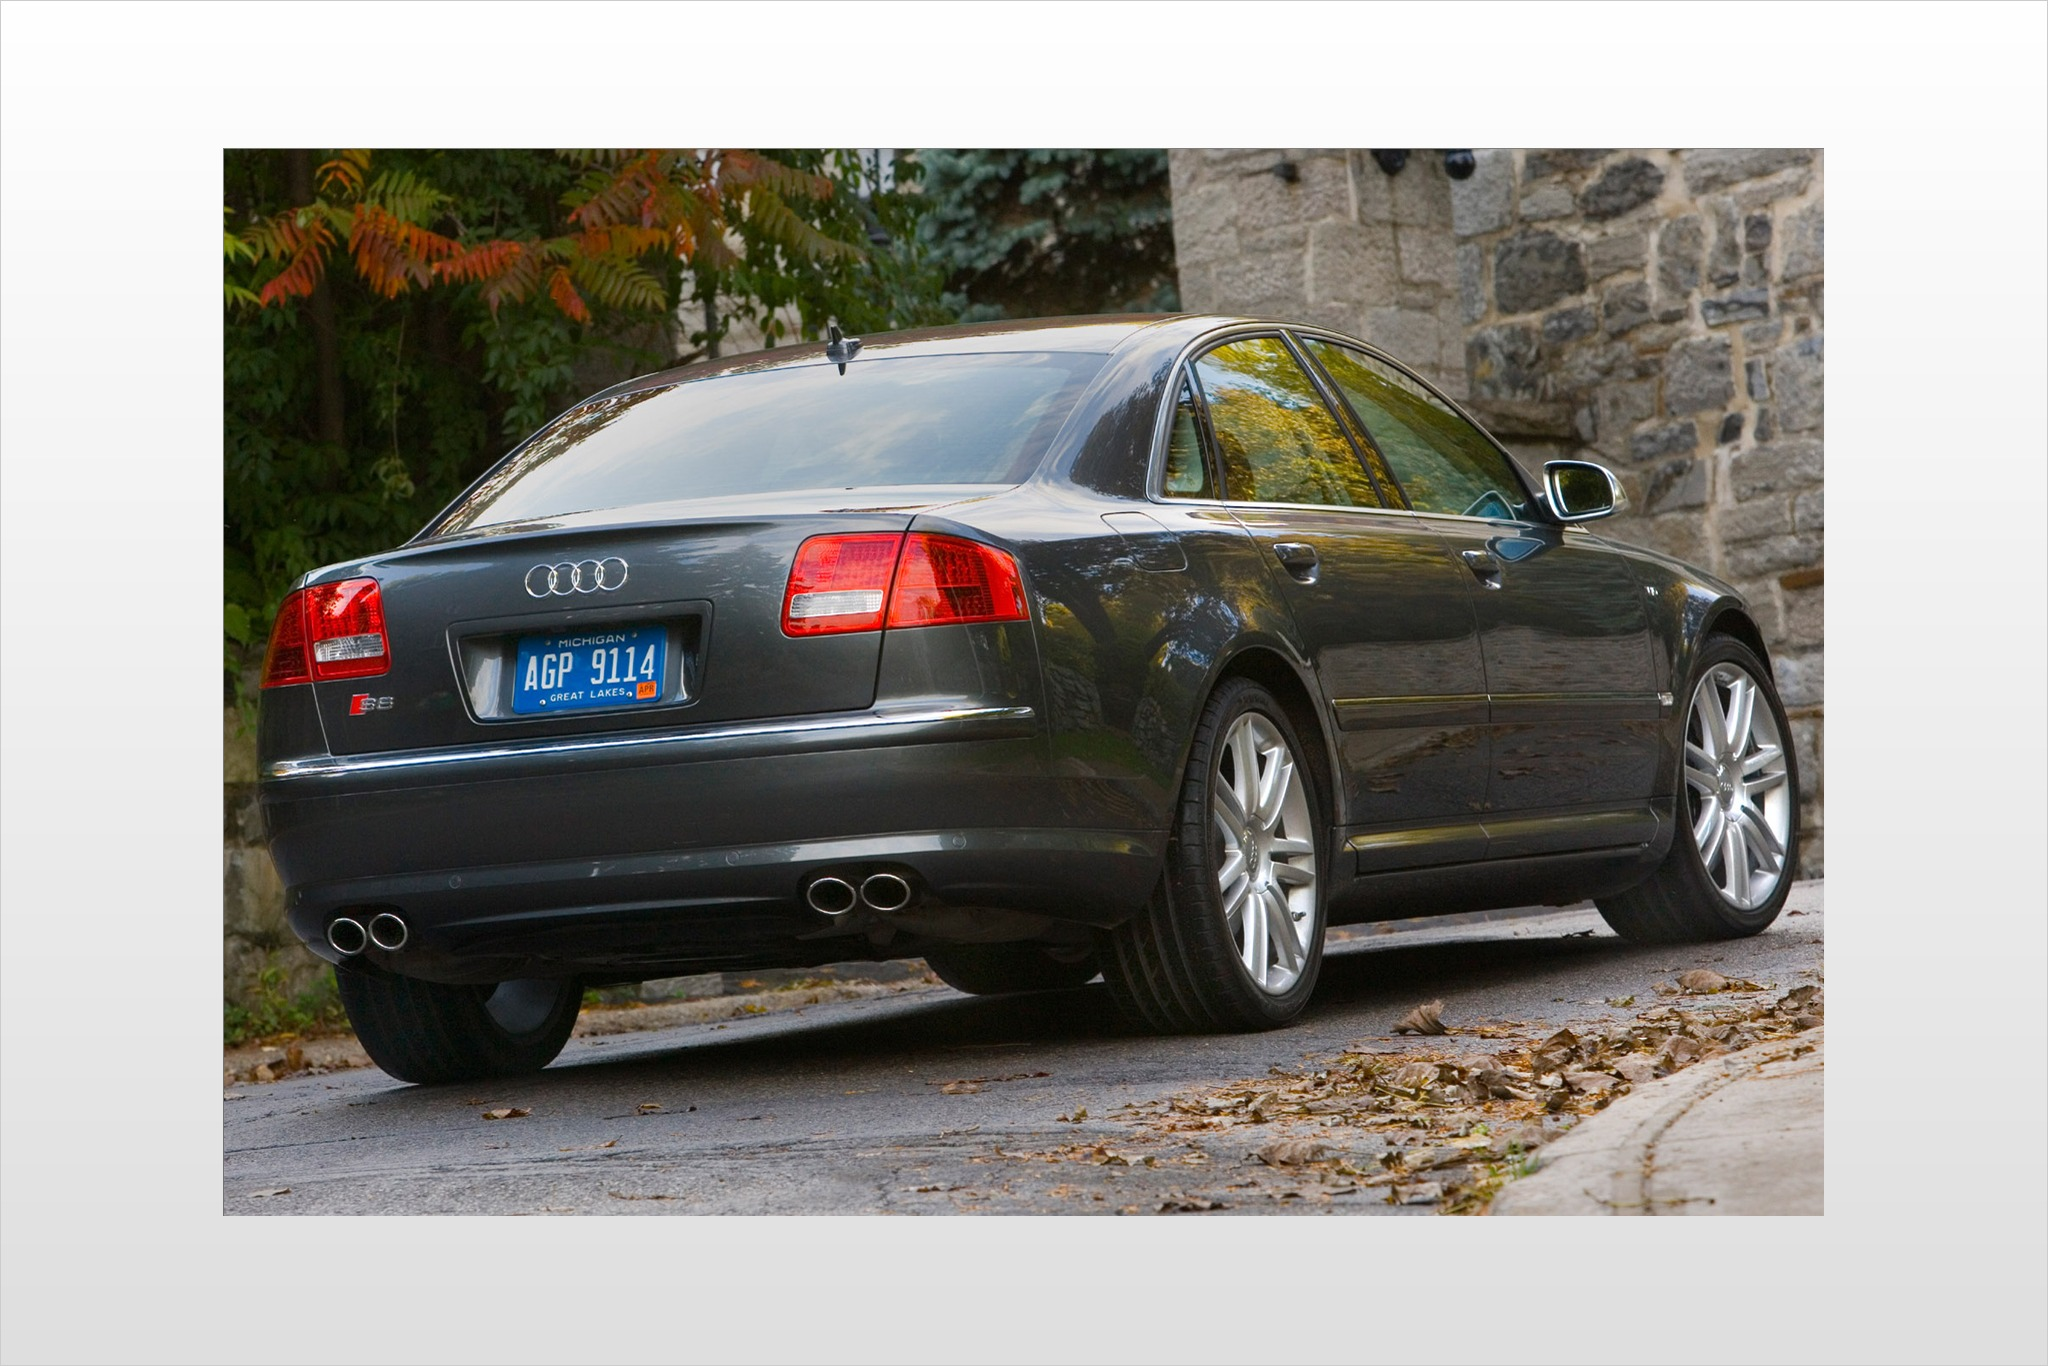 2008 Audi S8 Image 5